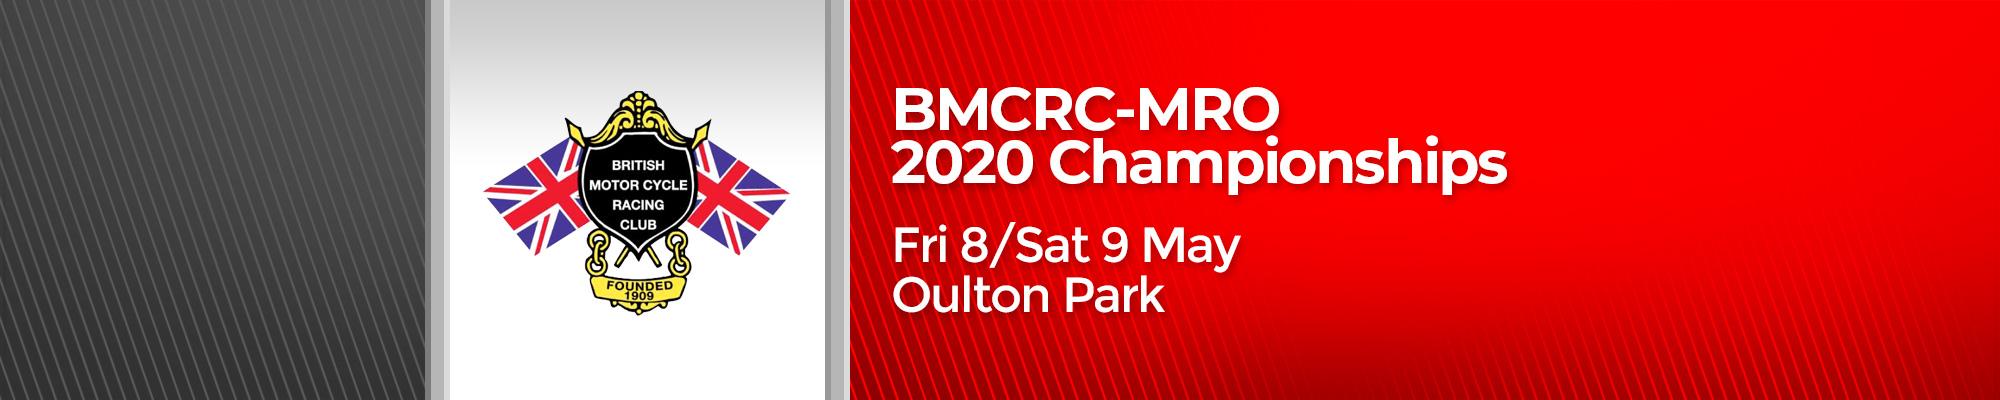 BMCRC-MRO 2020 Championships - POSTPONED